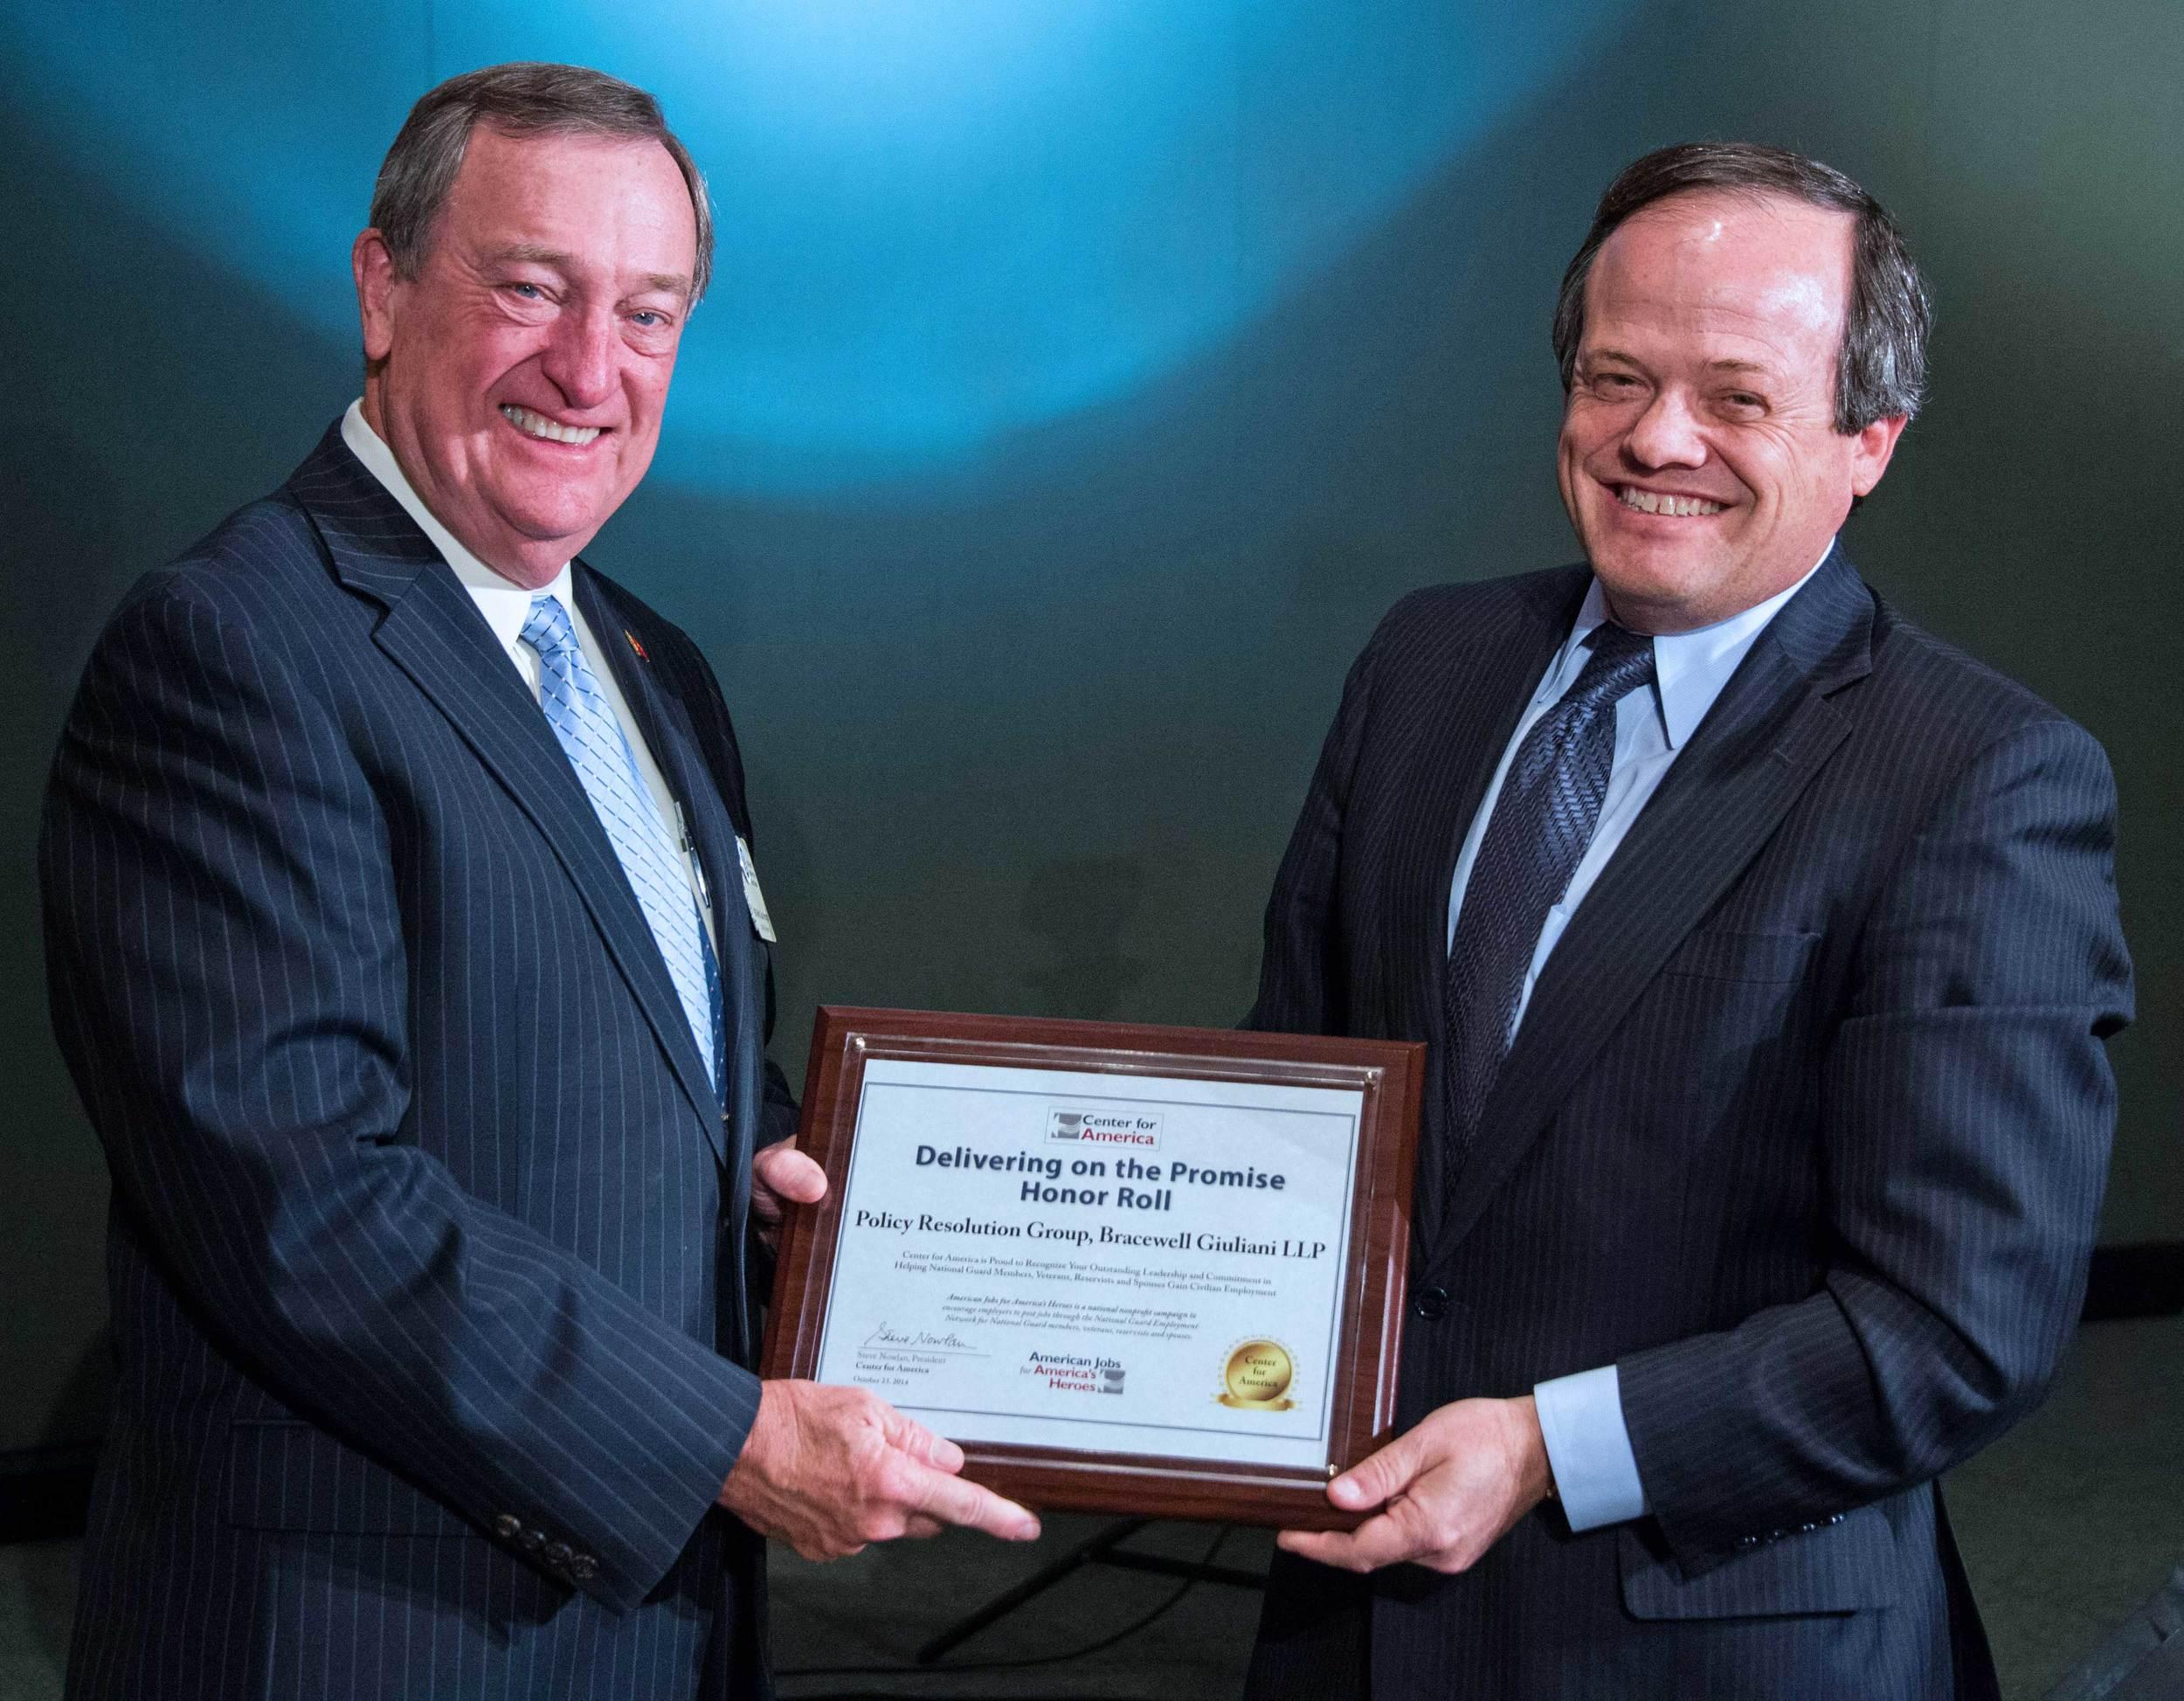 MG (ret) Gus Hargett presents the CFA Awardto Paul Nathanson, Policy Resolution Group, Bracewell & Giuliani.